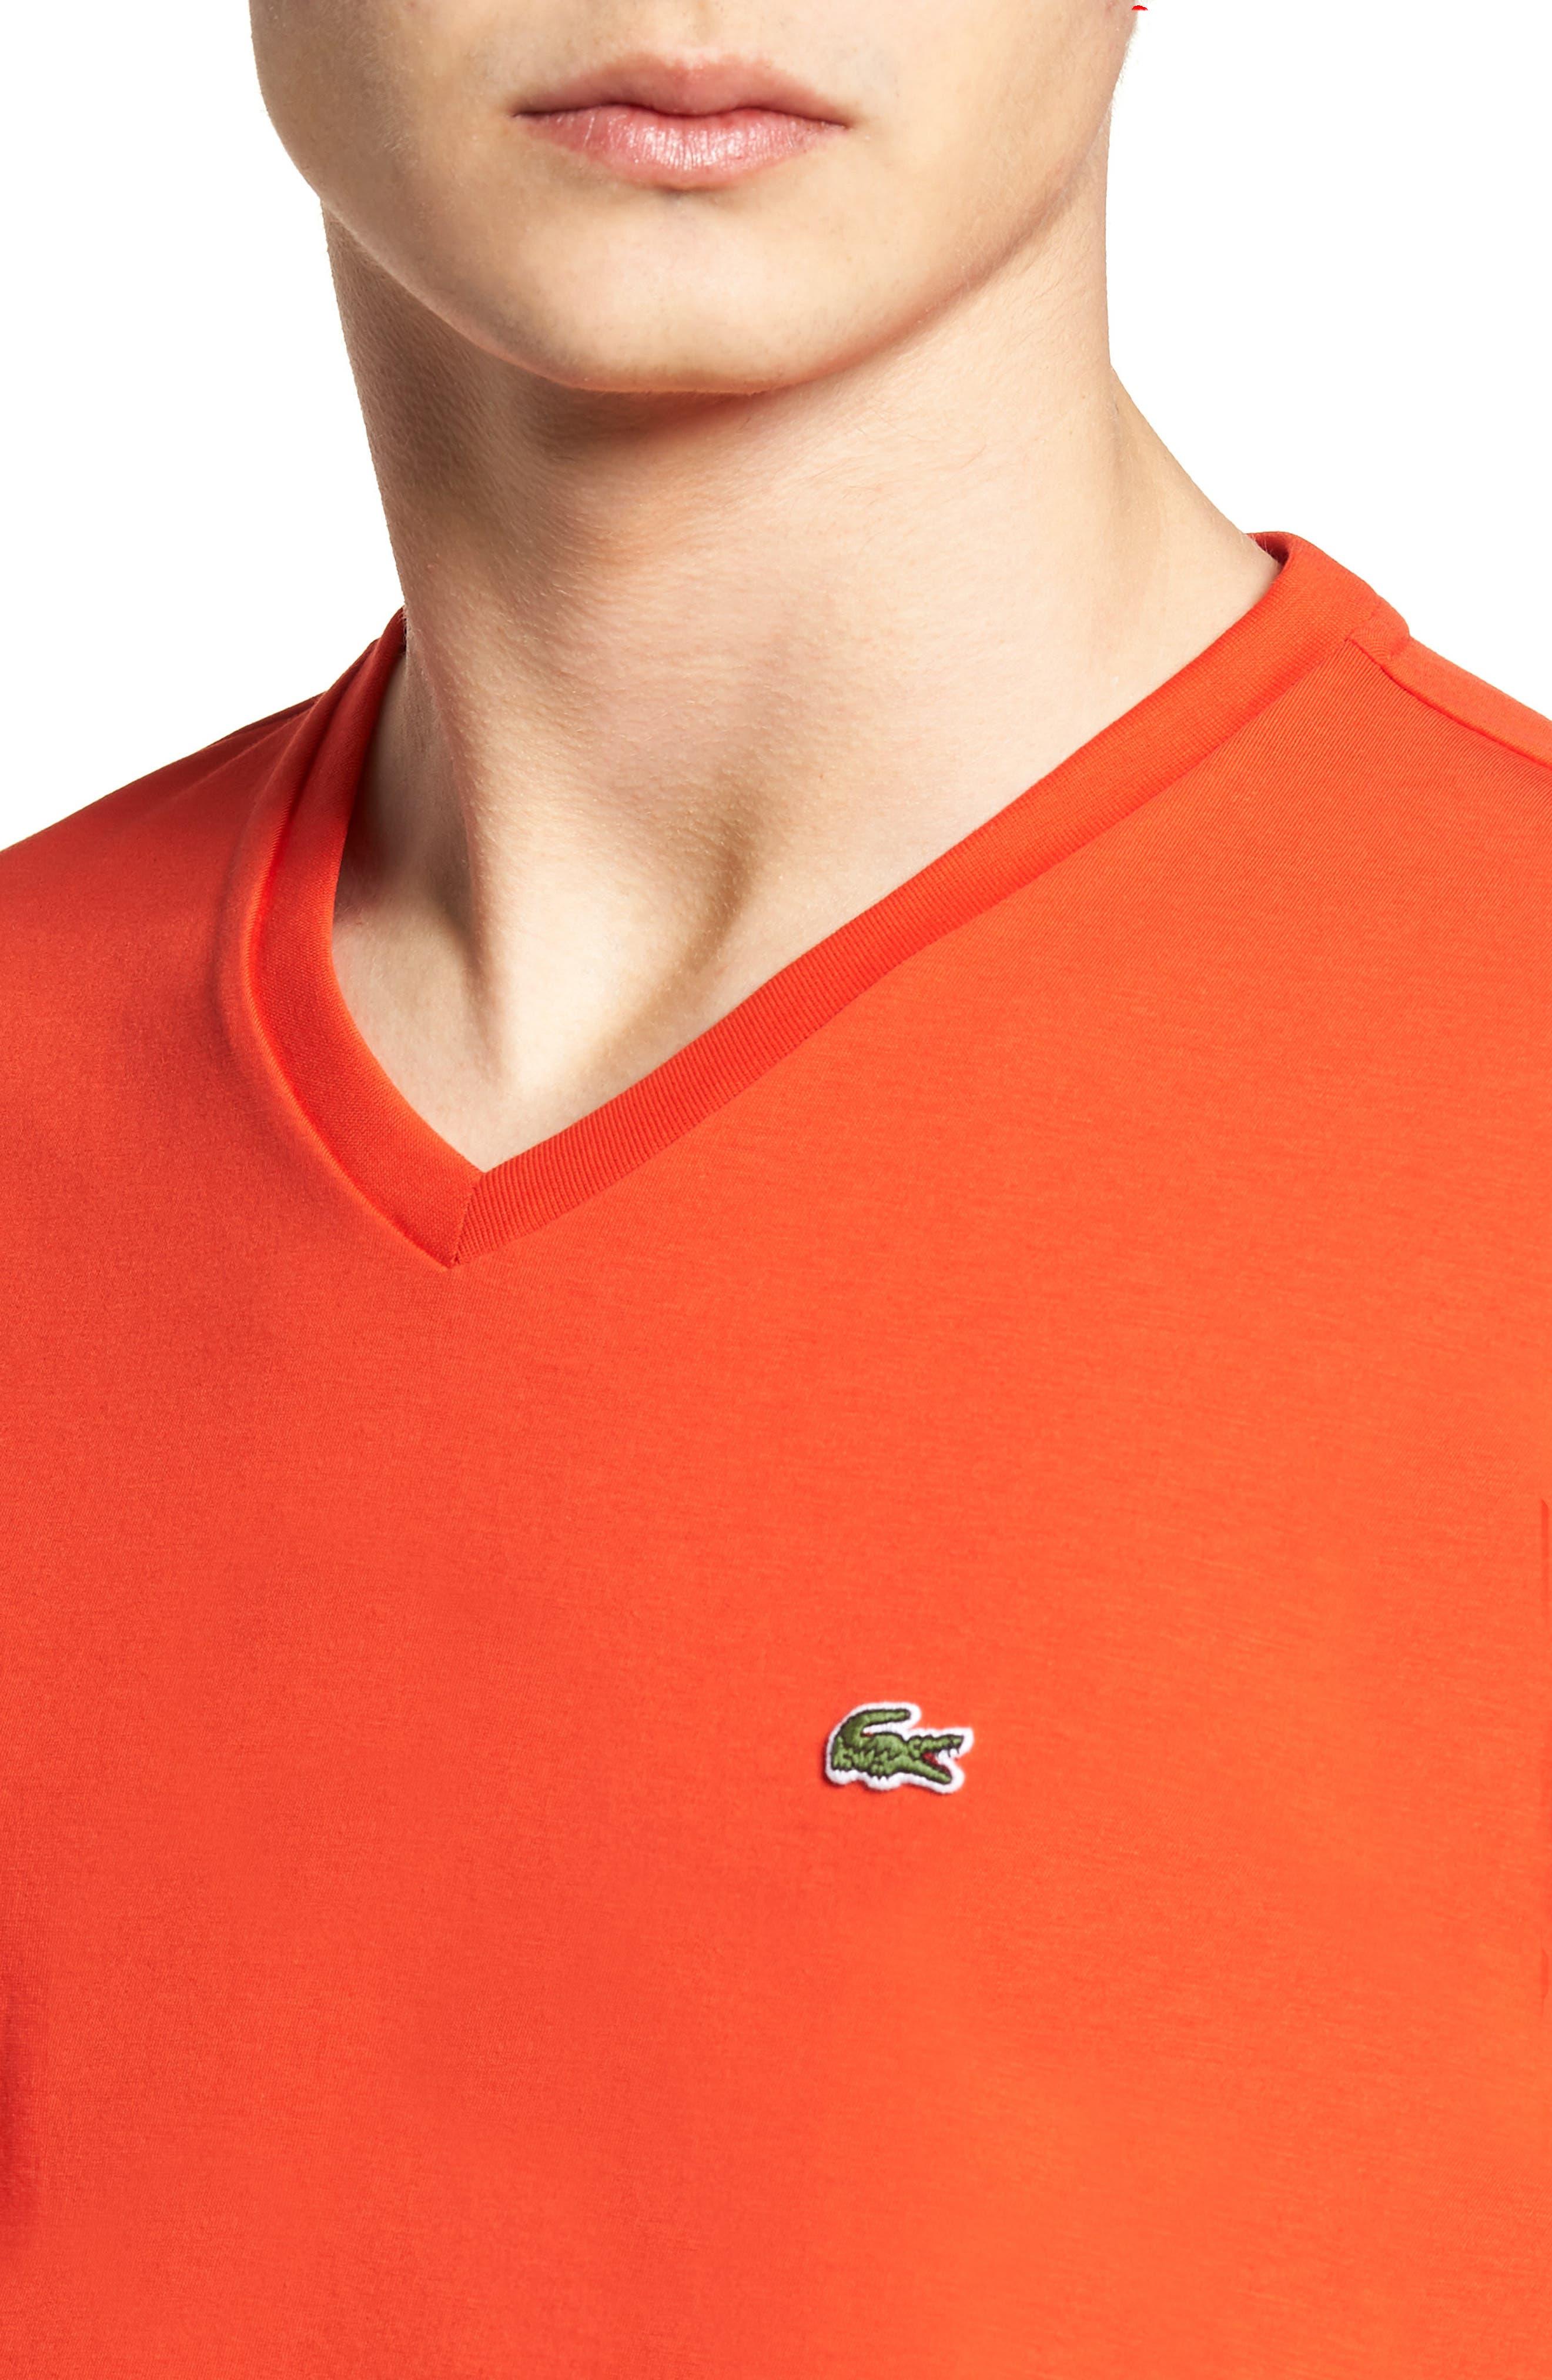 V-Neck Cotton T-Shirt,                             Alternate thumbnail 18, color,